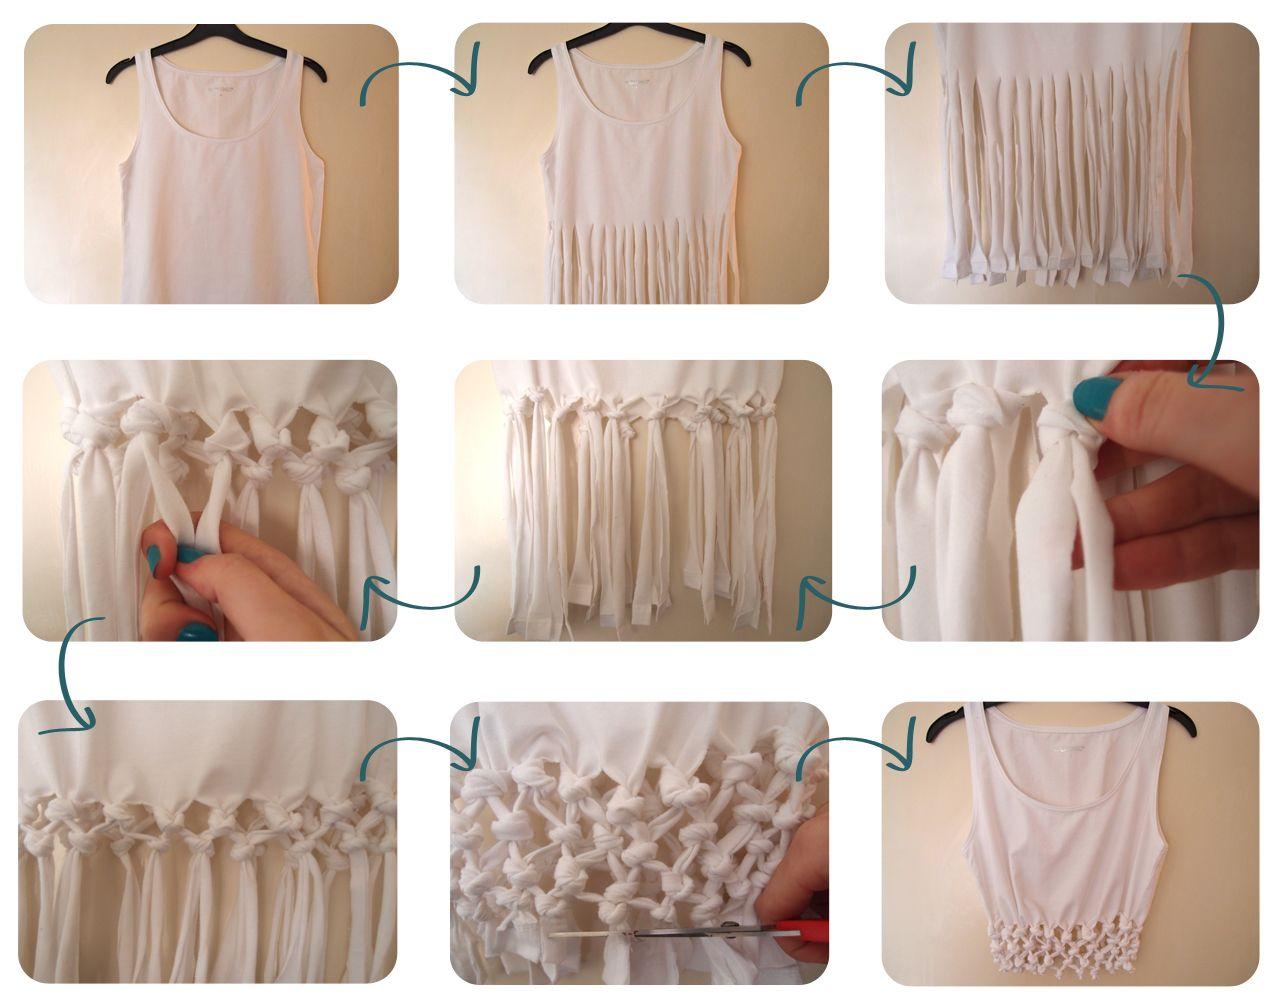 Design t shirt diy - Design T Shirt Diy 58